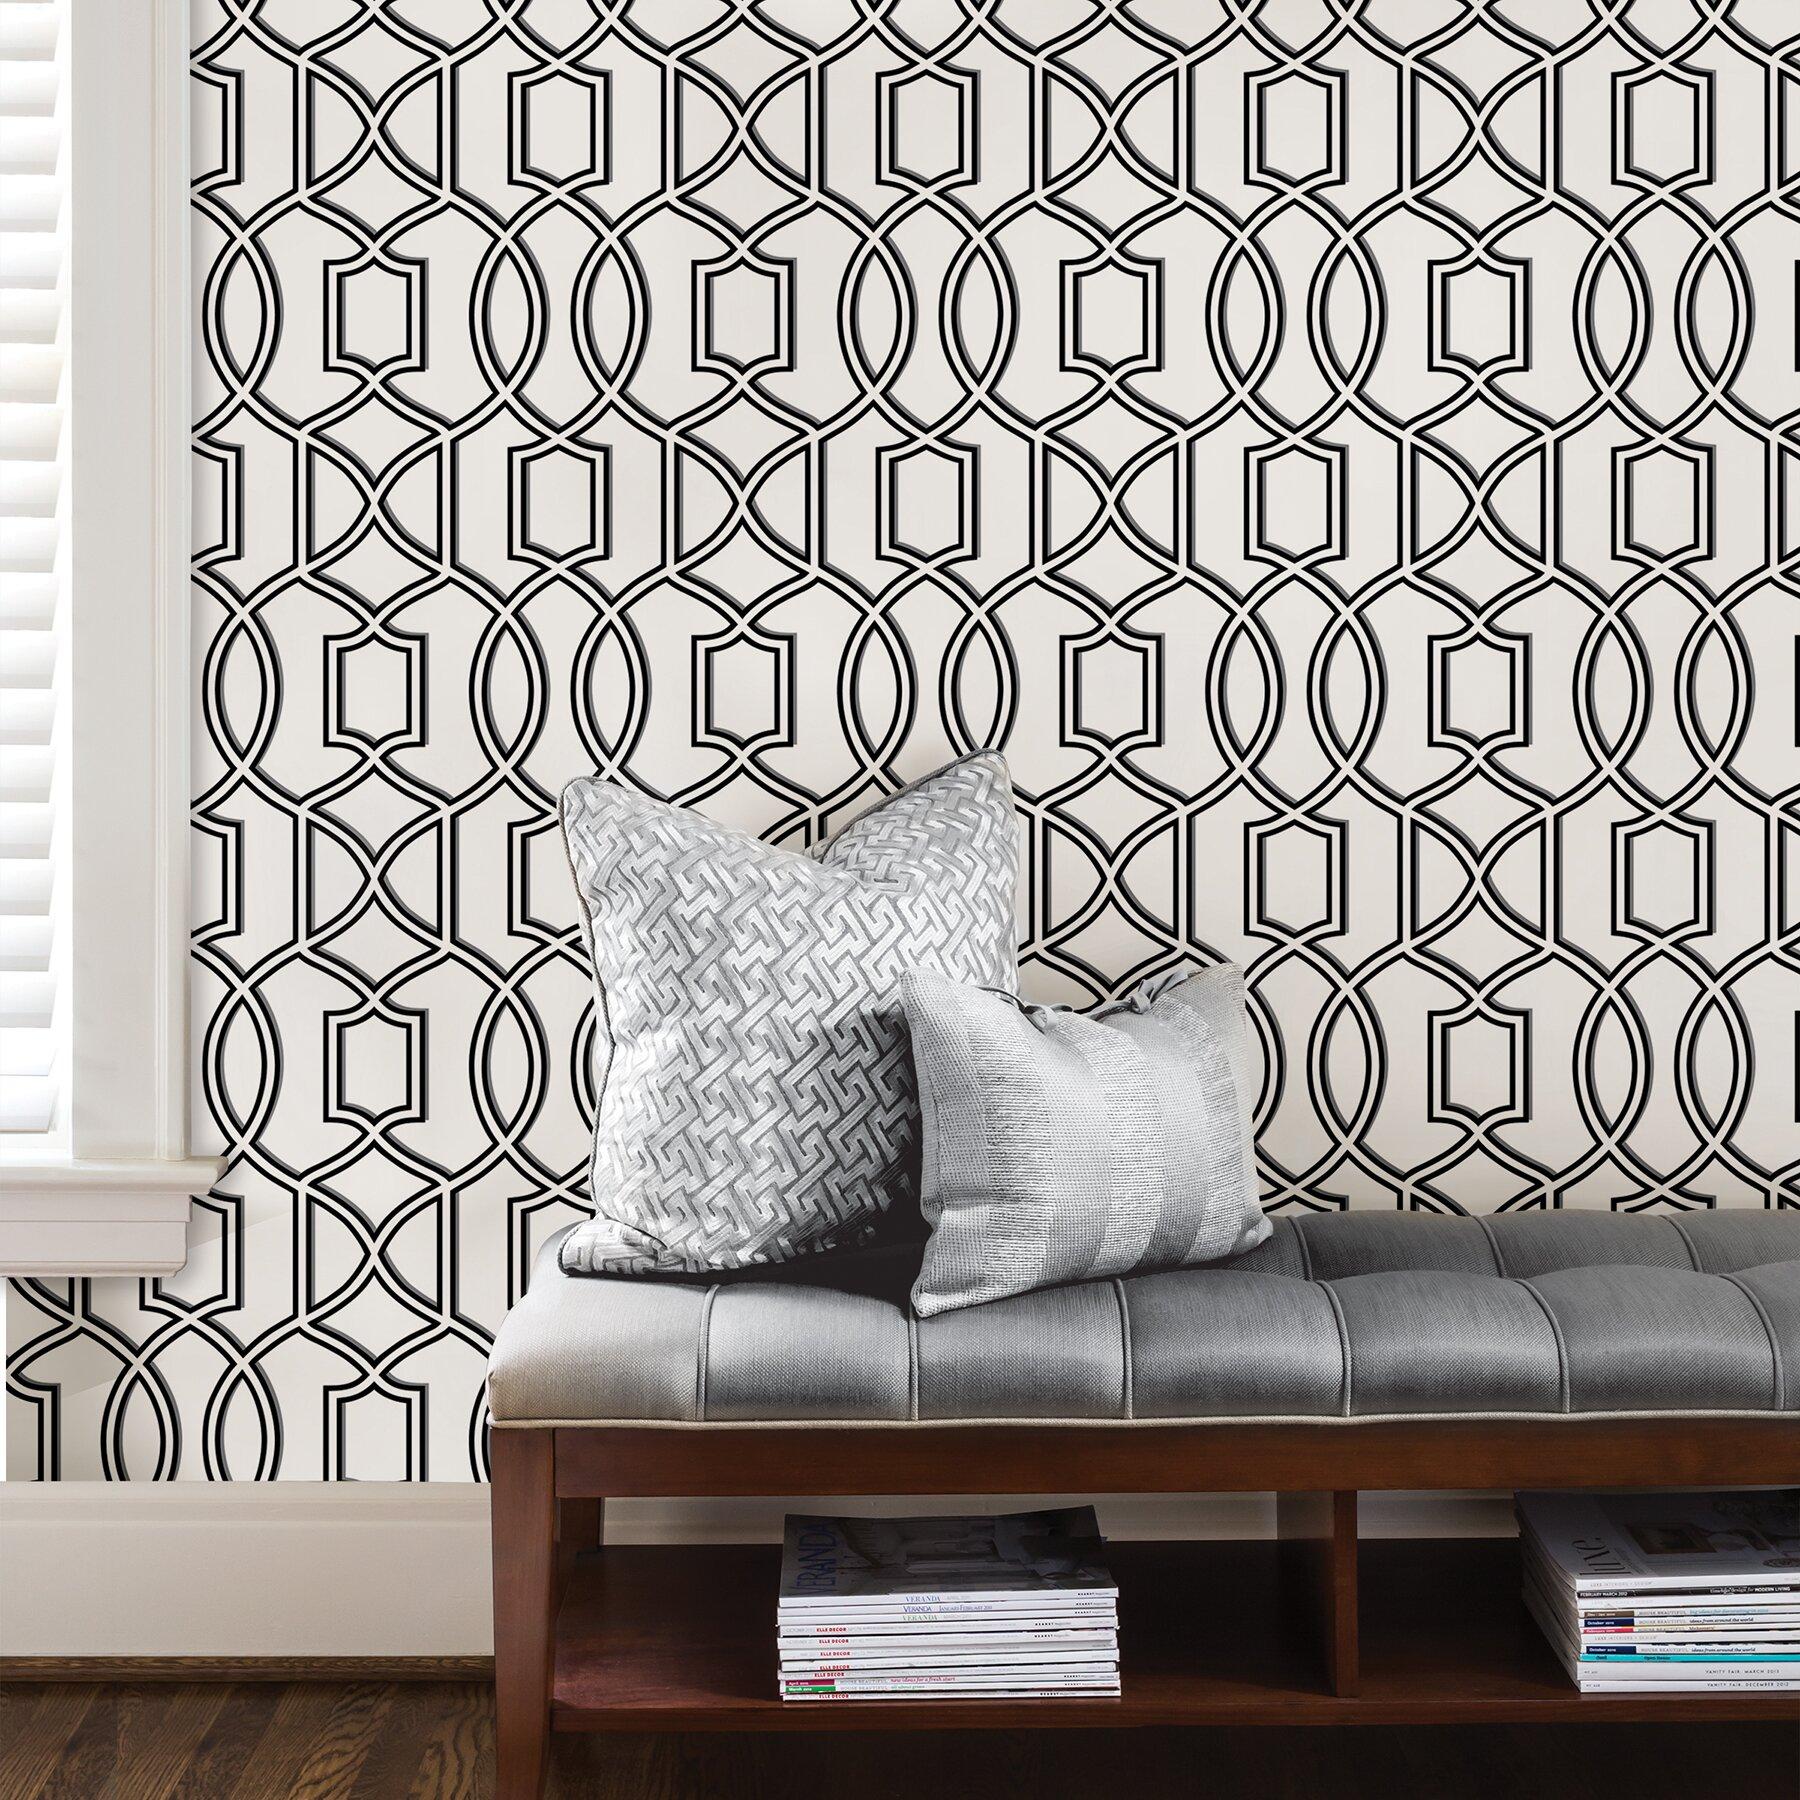 Wallpops Nu 18 X 20 5 Uptown Trellis Black White Peel HD Wallpapers Download Free Images Wallpaper [1000image.com]